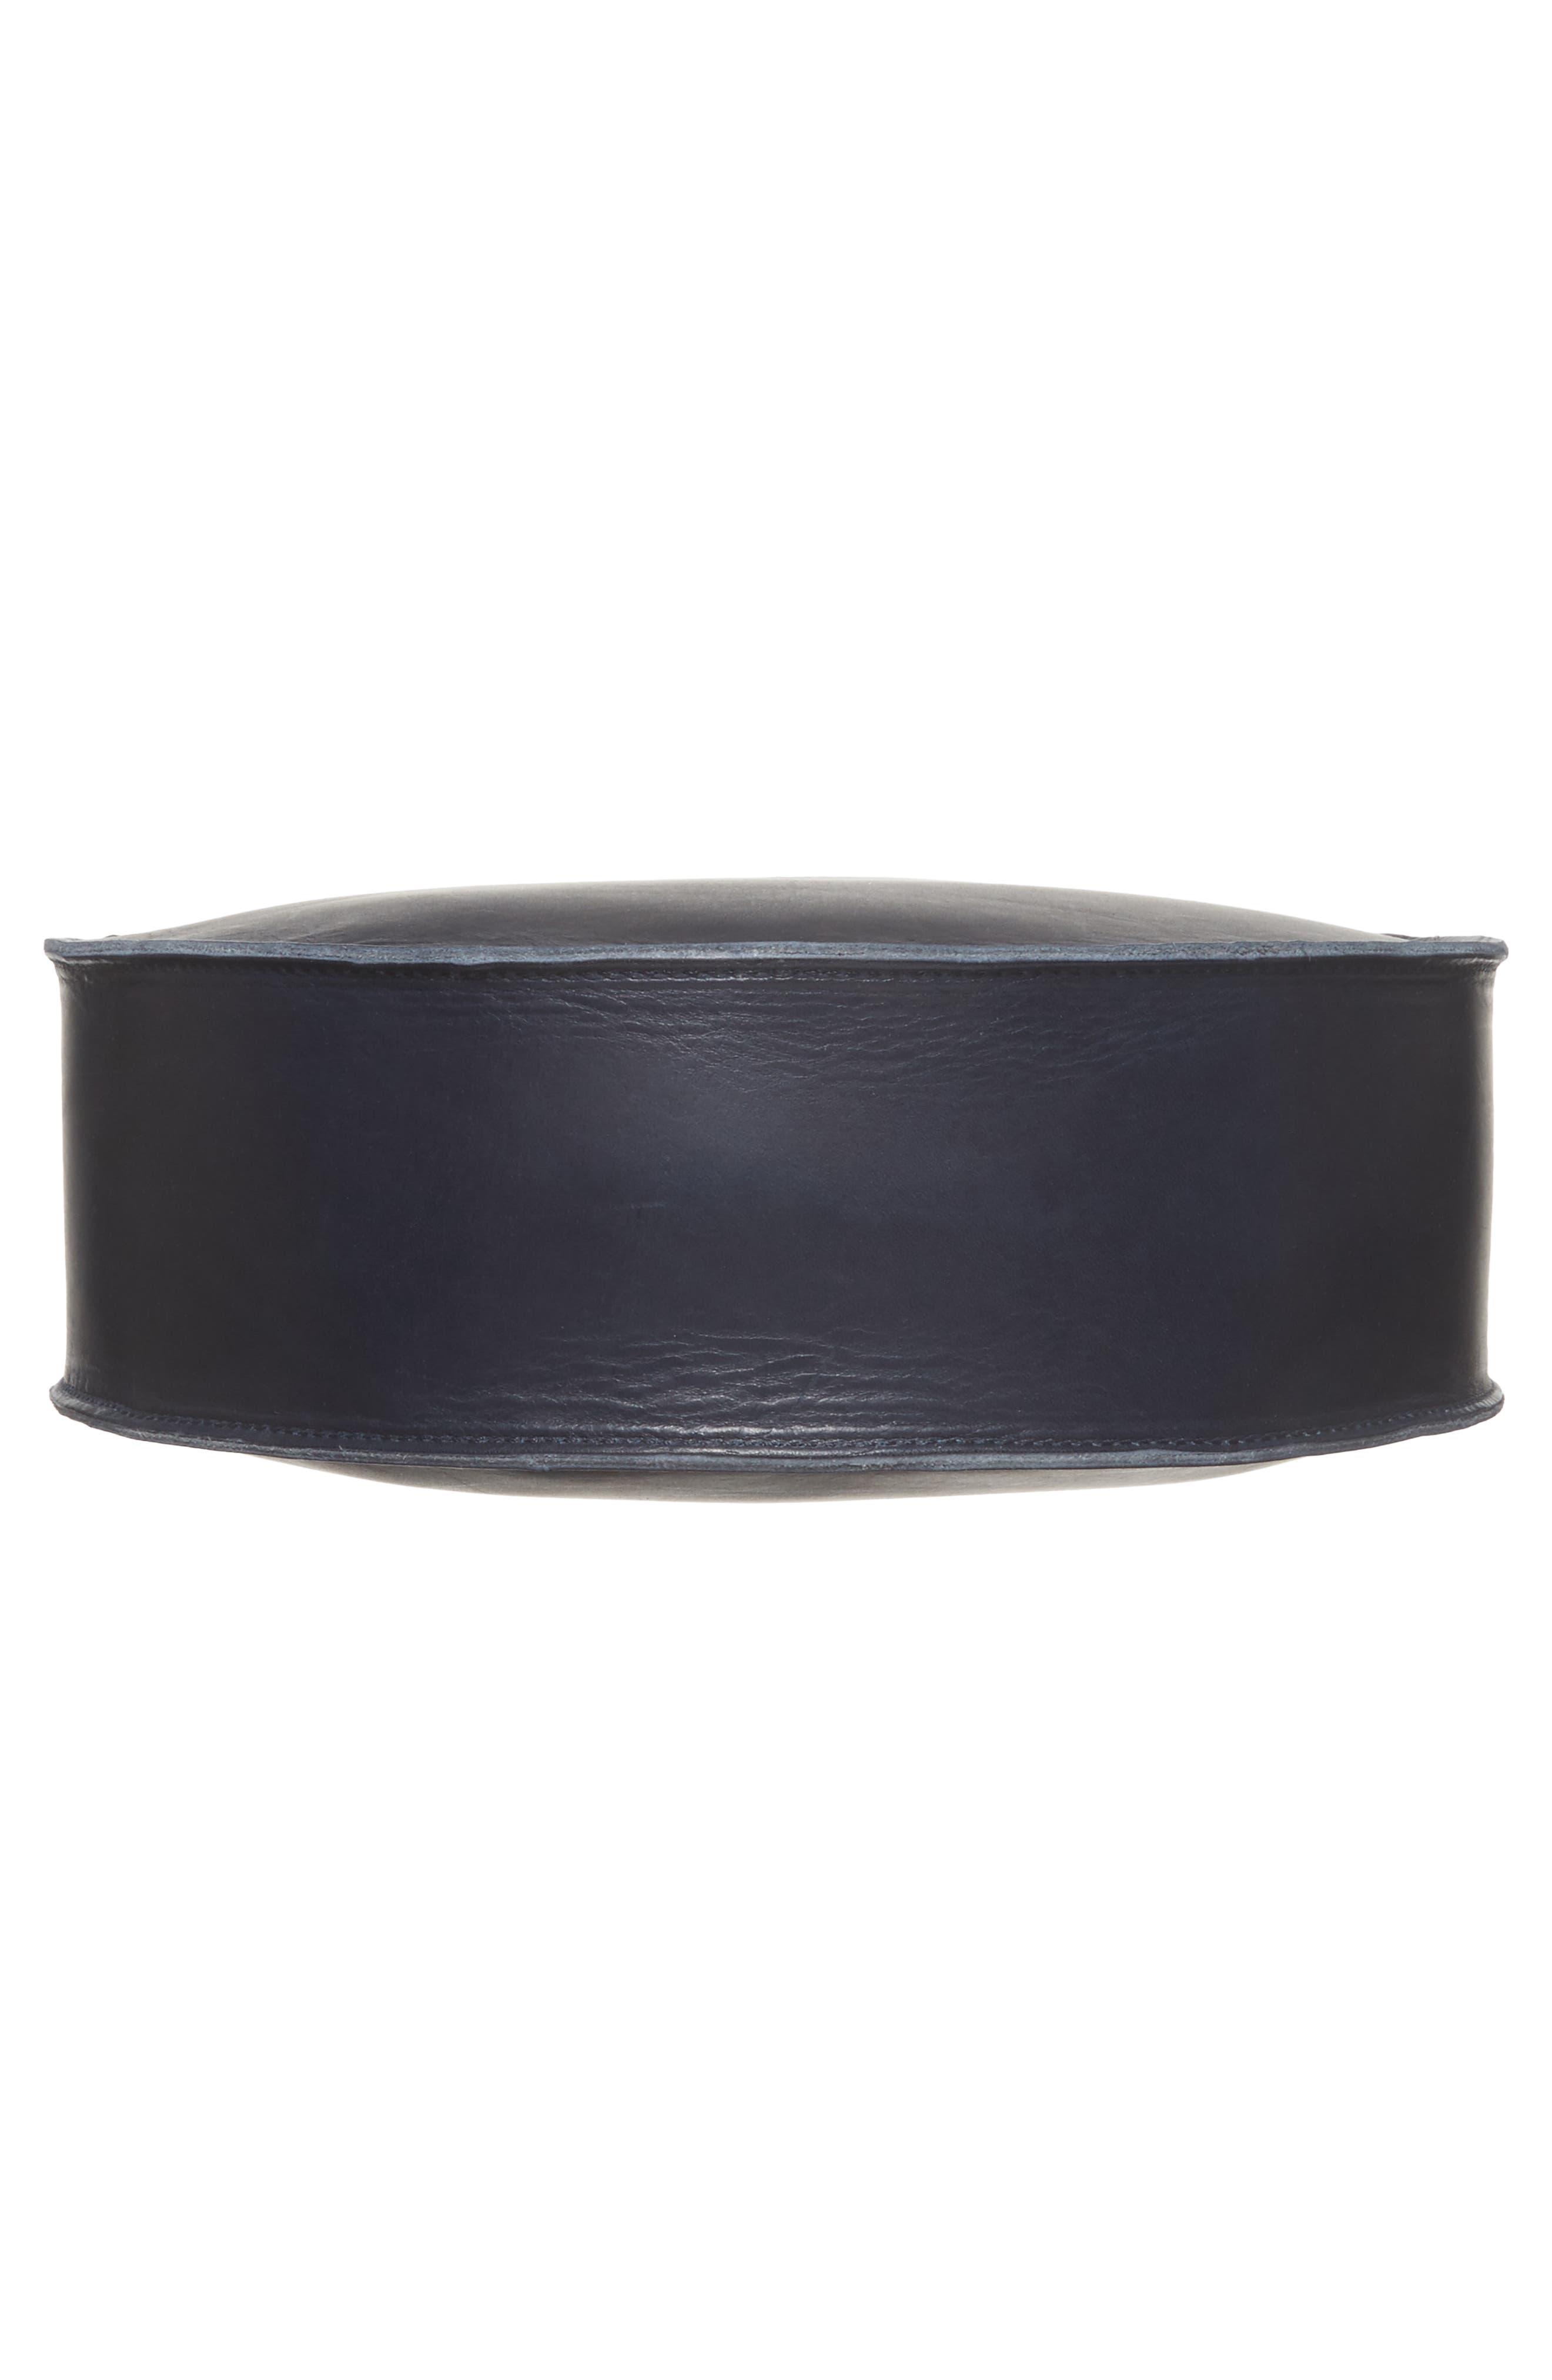 Petite Alistair Leather Circular Crossbody Bag,                             Alternate thumbnail 6, color,                             410